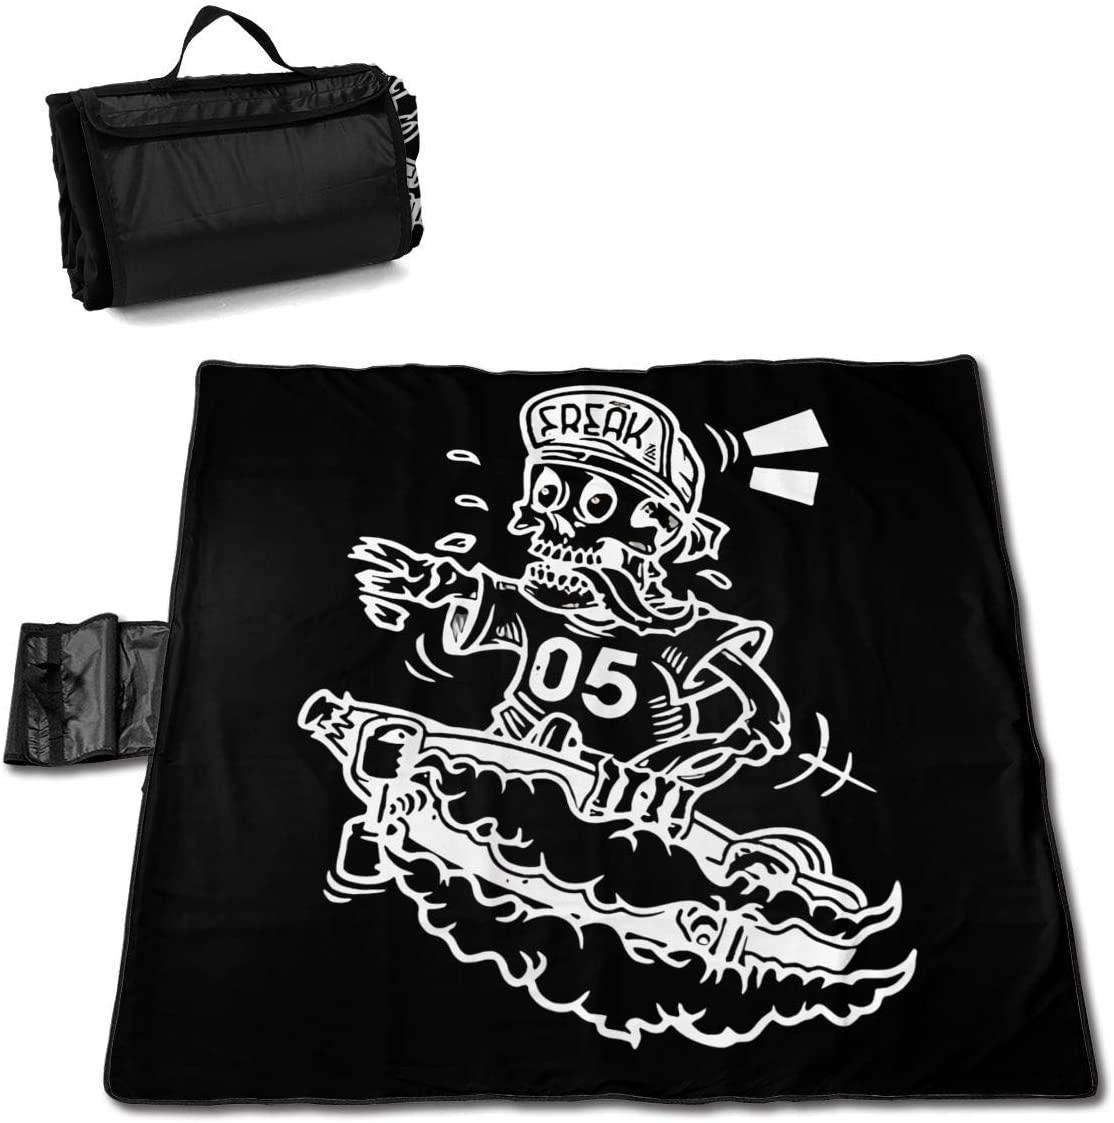 Htw Skater Death Street Skate Skull Portable Printed Picnic Blanket Waterproof 59x57(in)